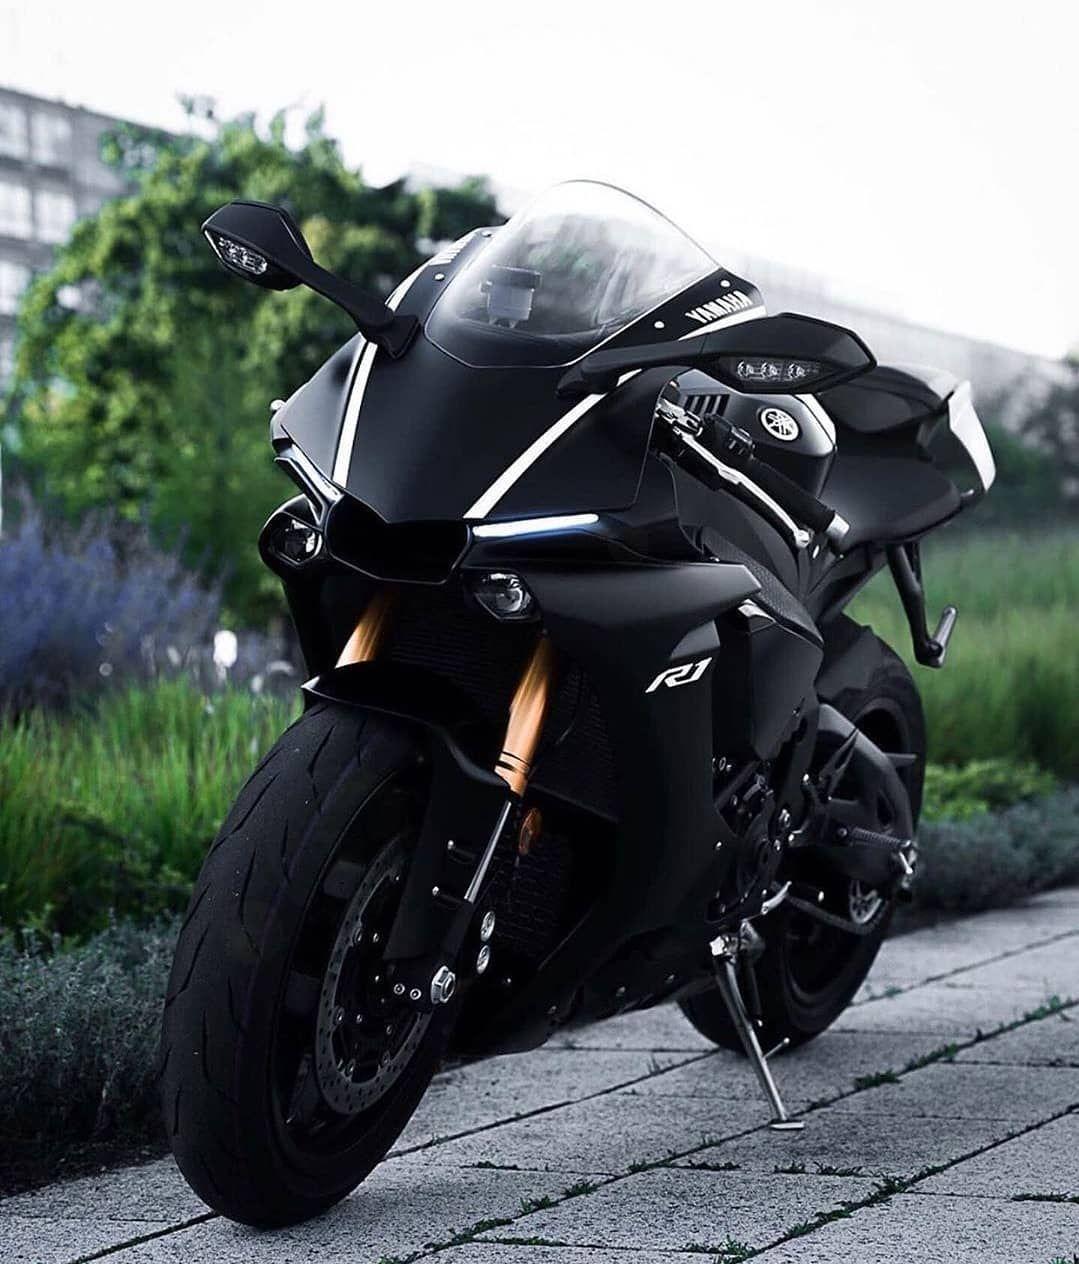 Pin By Kate Matters On Bikes Sports Bikes Motorcycles Yamaha Motorcycles Sport Bikes